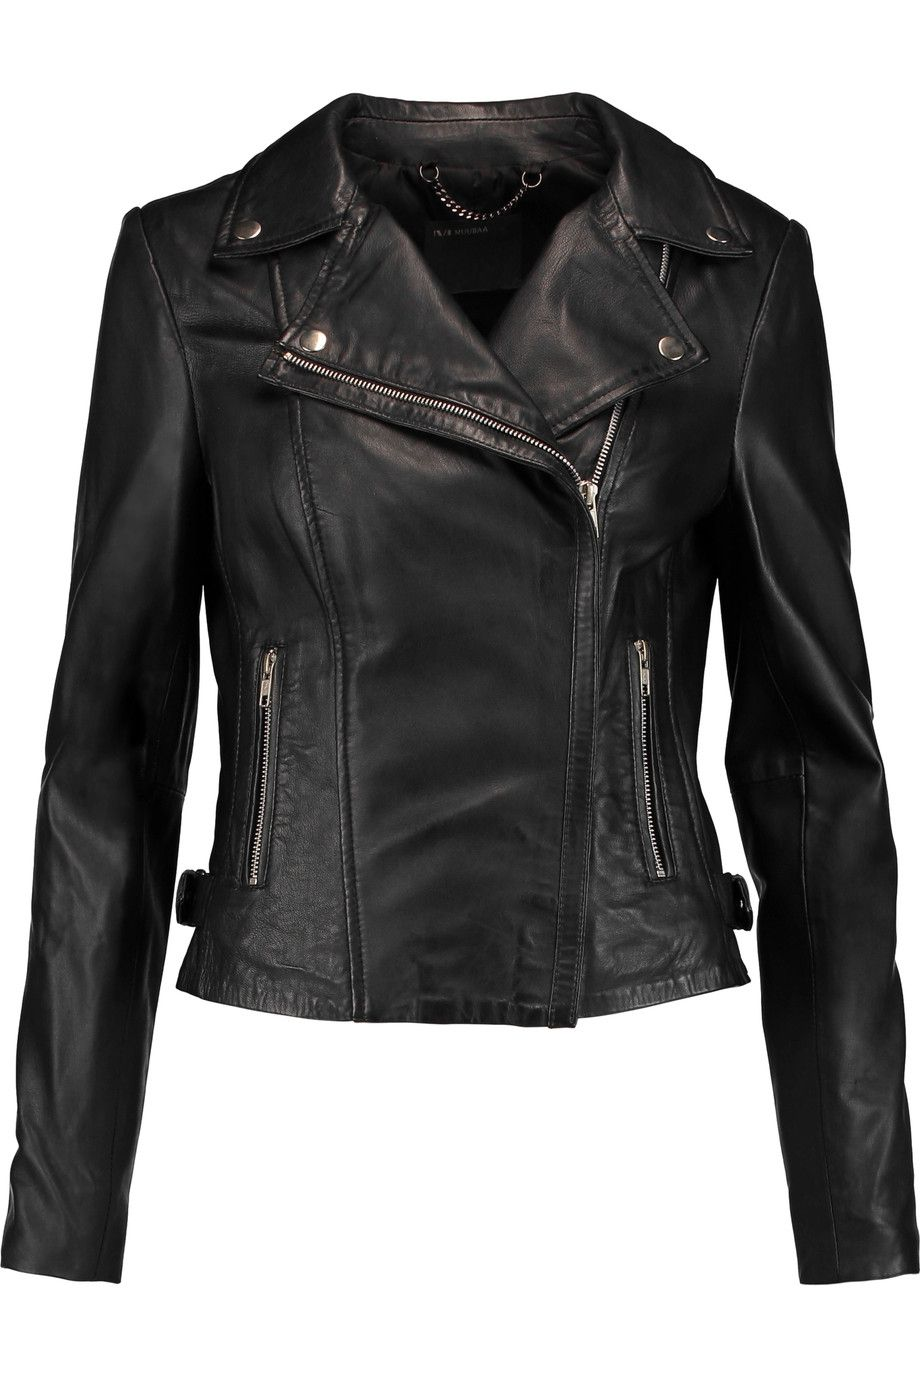 Muubaa Monteria Leather Biker Jacket Modesens [ 1380 x 920 Pixel ]